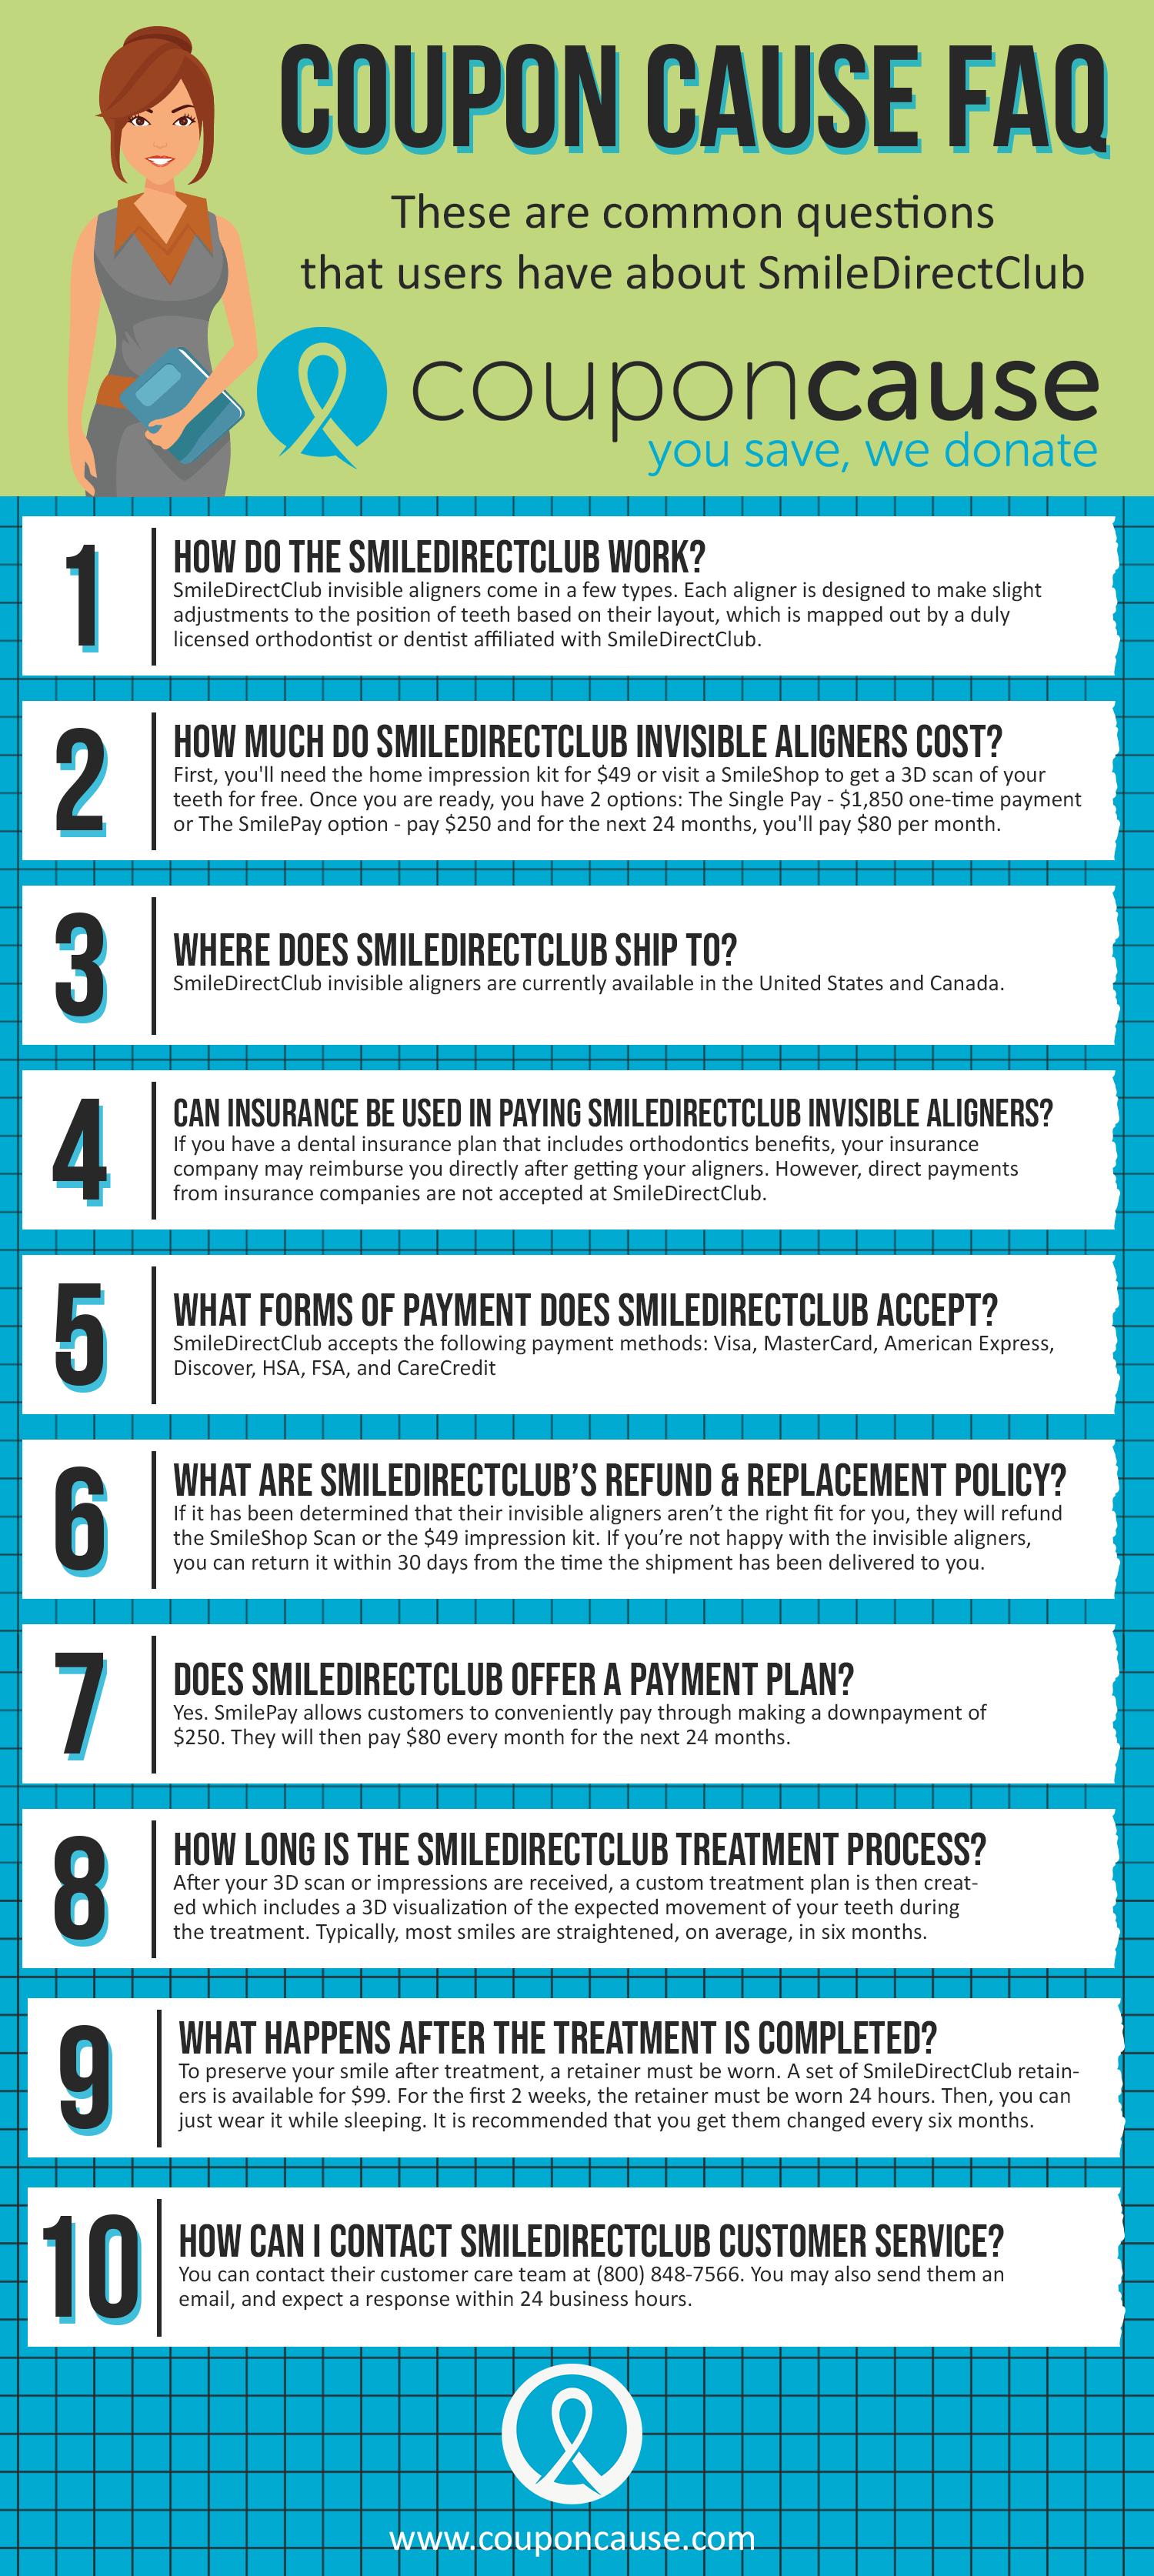 SmileDirectClub Coupon Cause FAQ (C.C. FAQ)